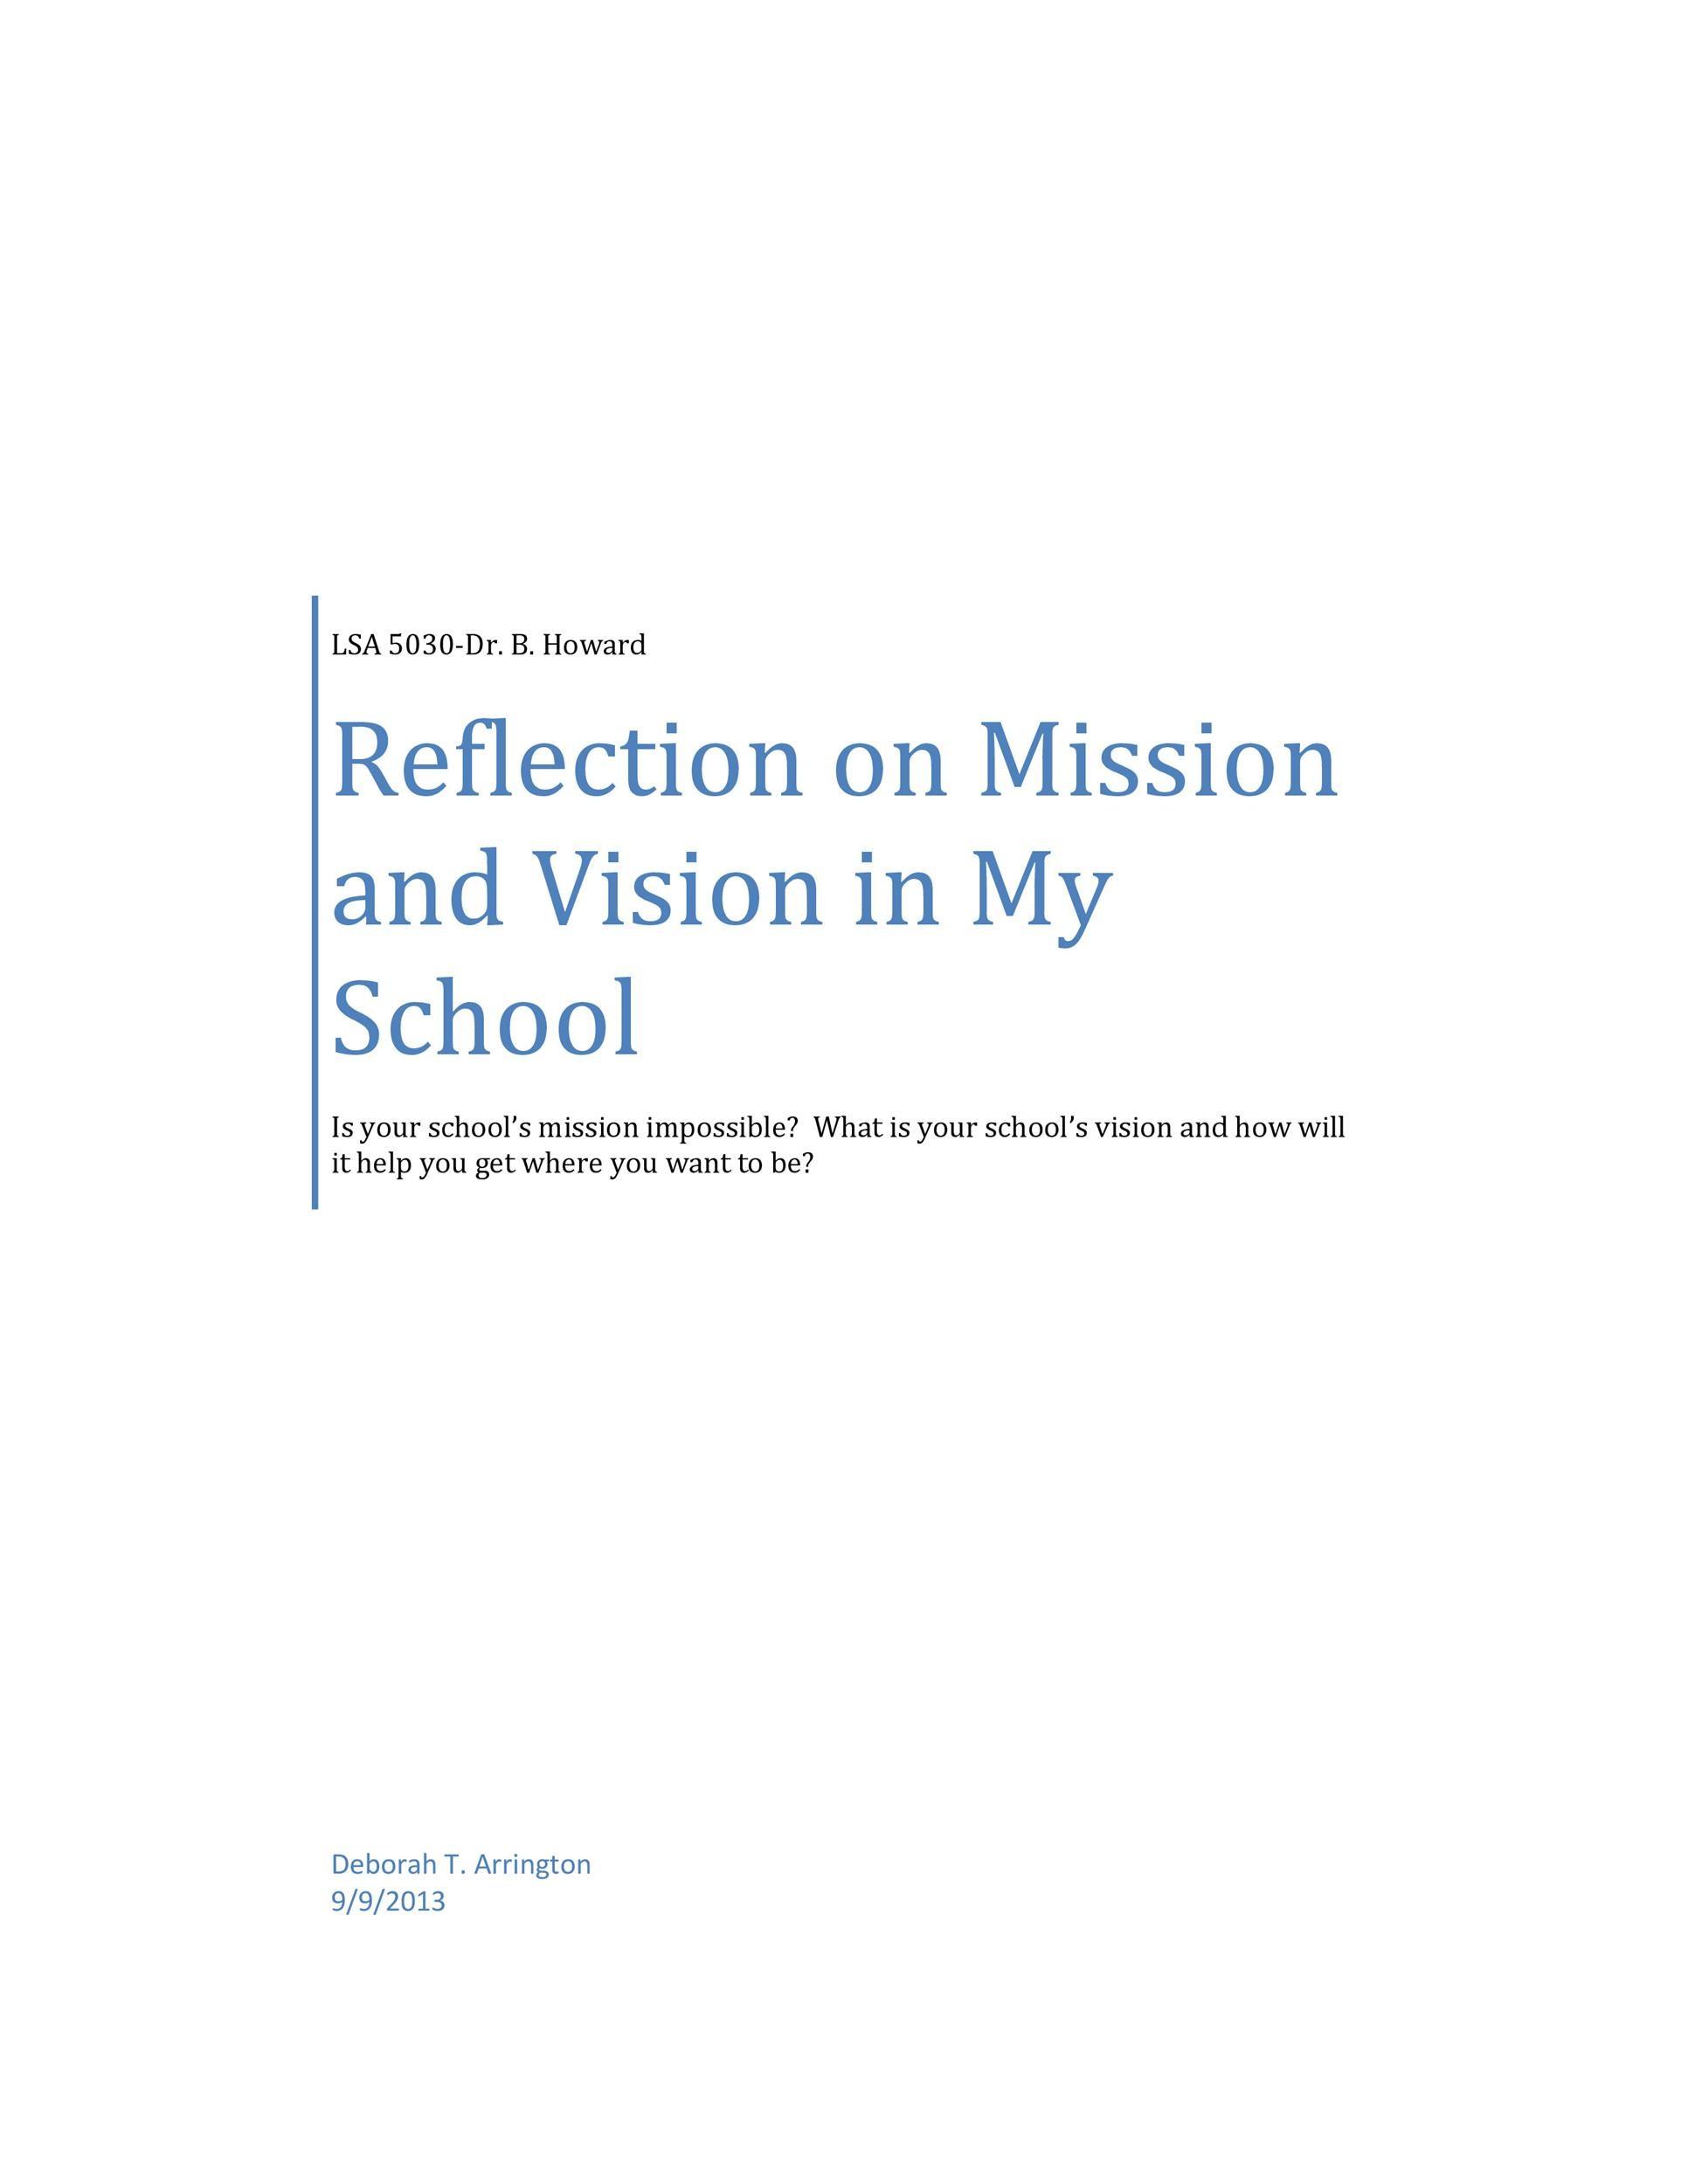 Free reflective essay example 13